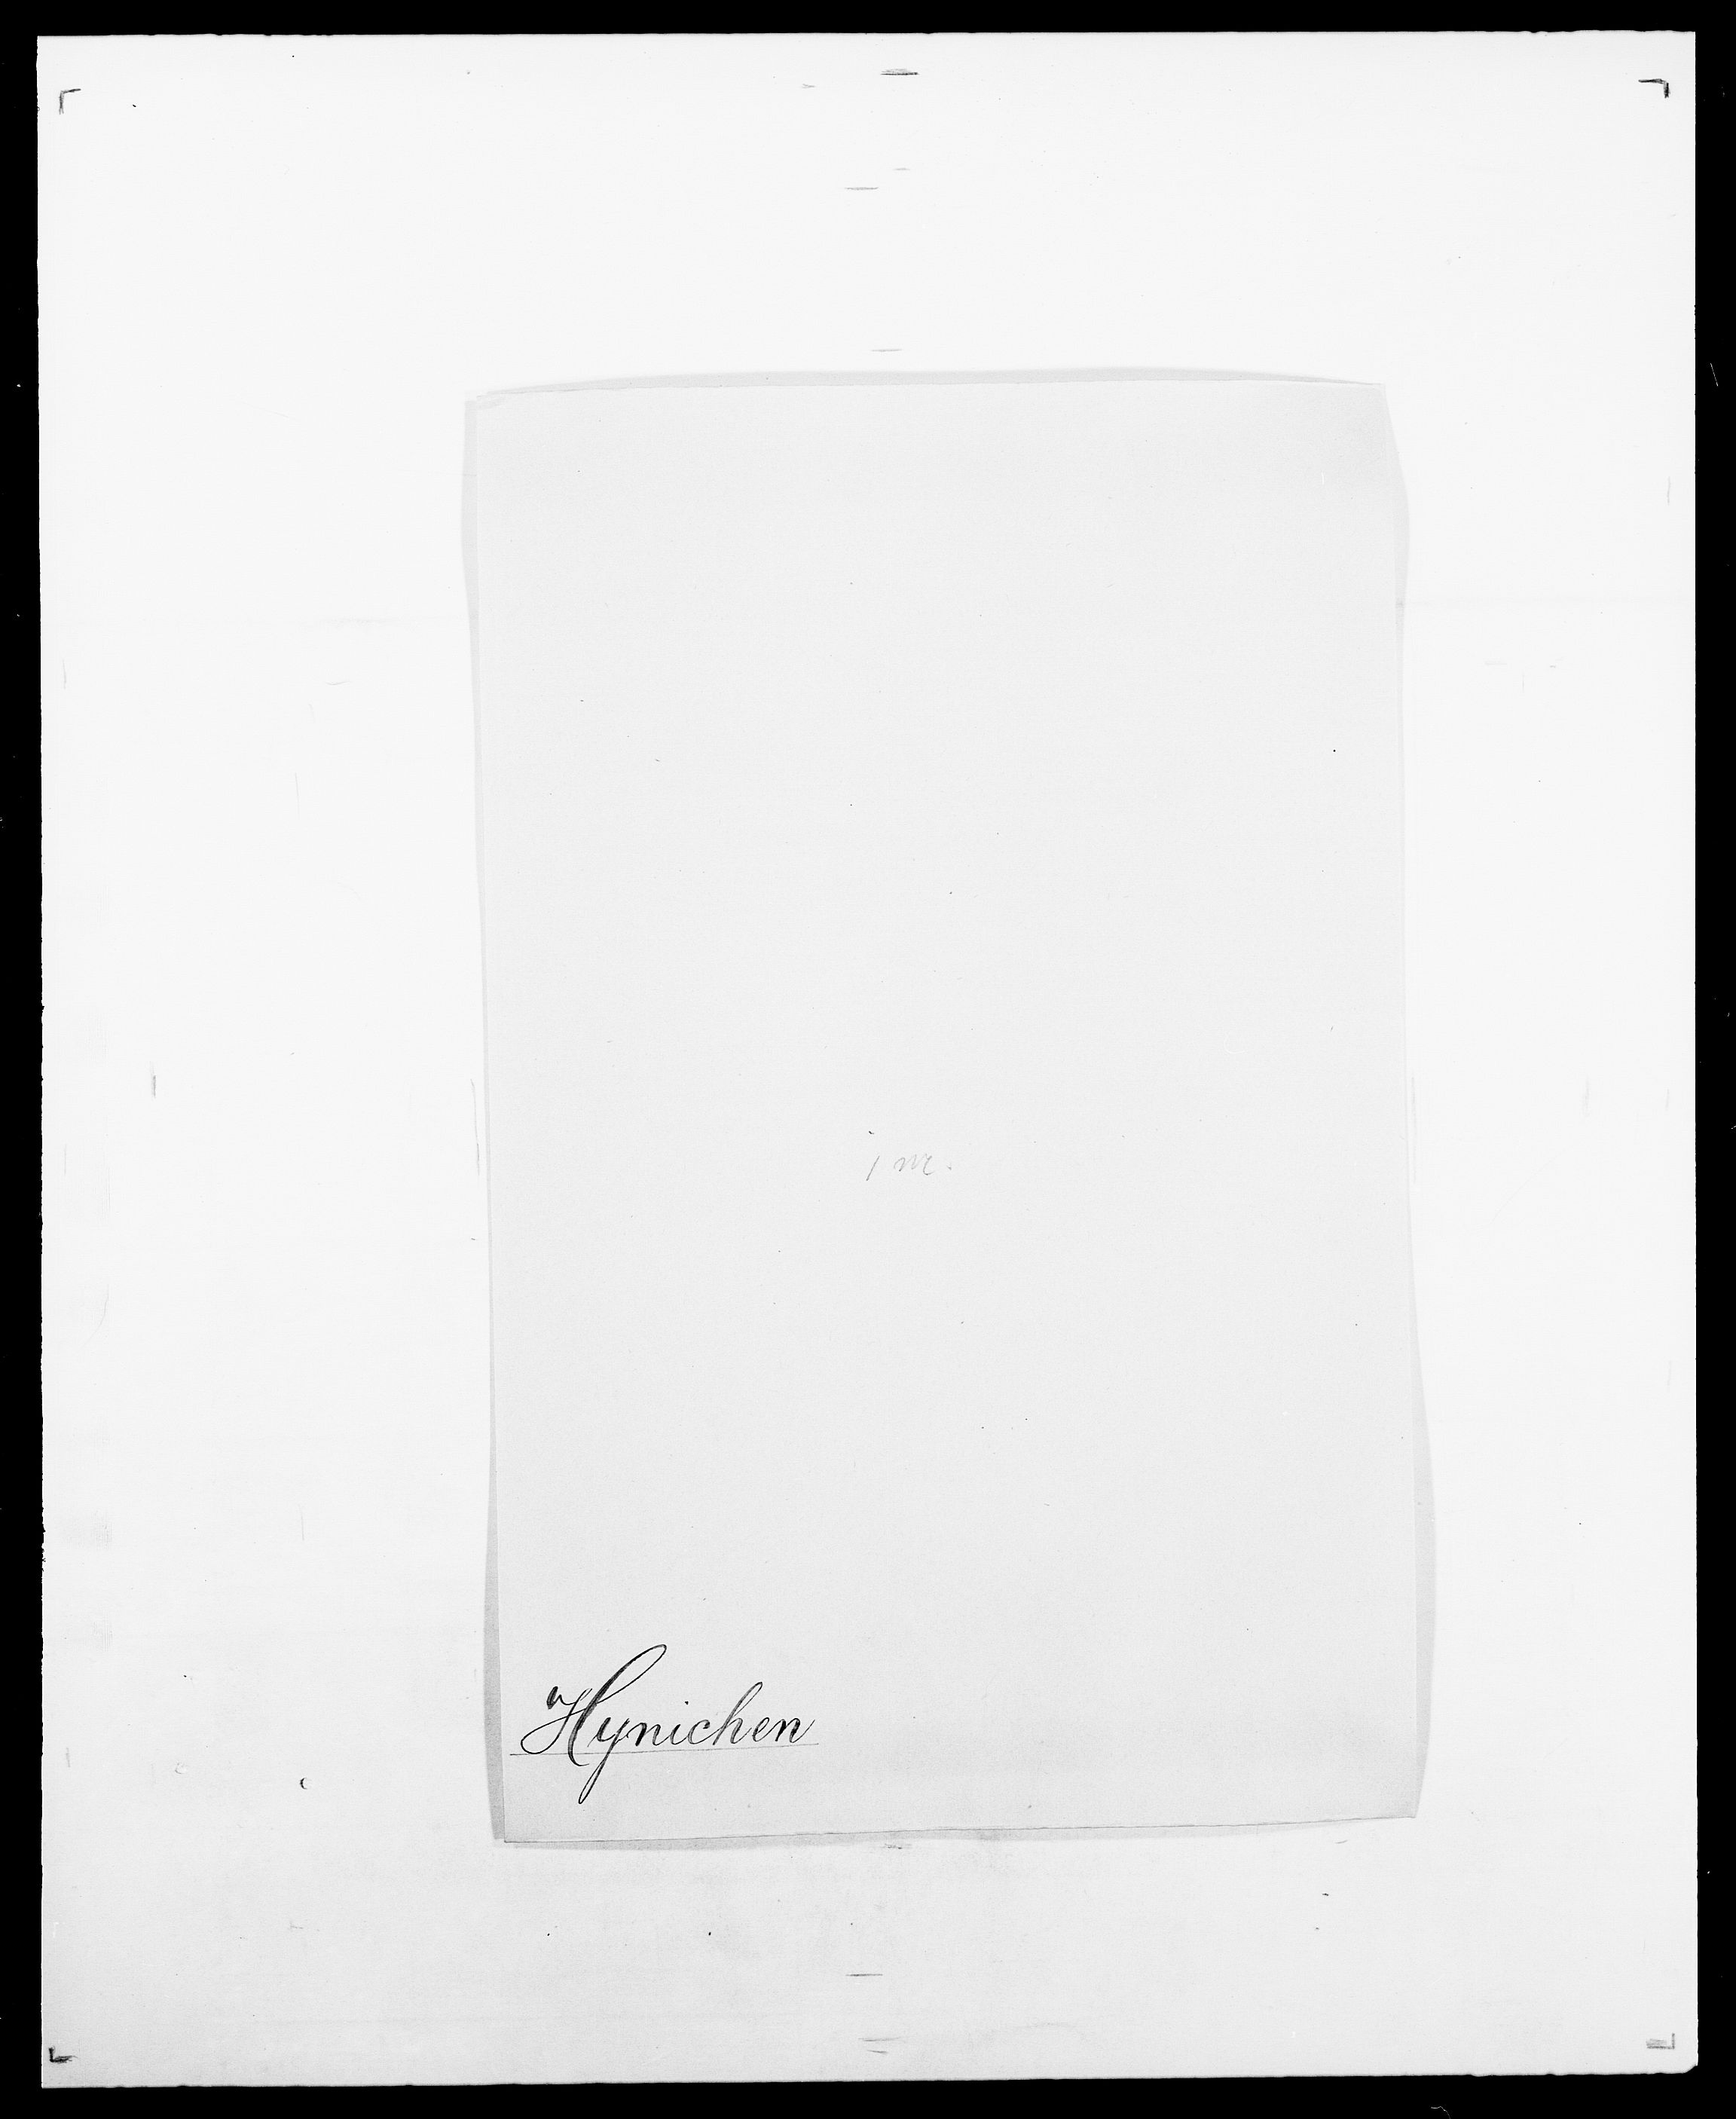 SAO, Delgobe, Charles Antoine - samling, D/Da/L0019: van der Hude - Joys, s. 282